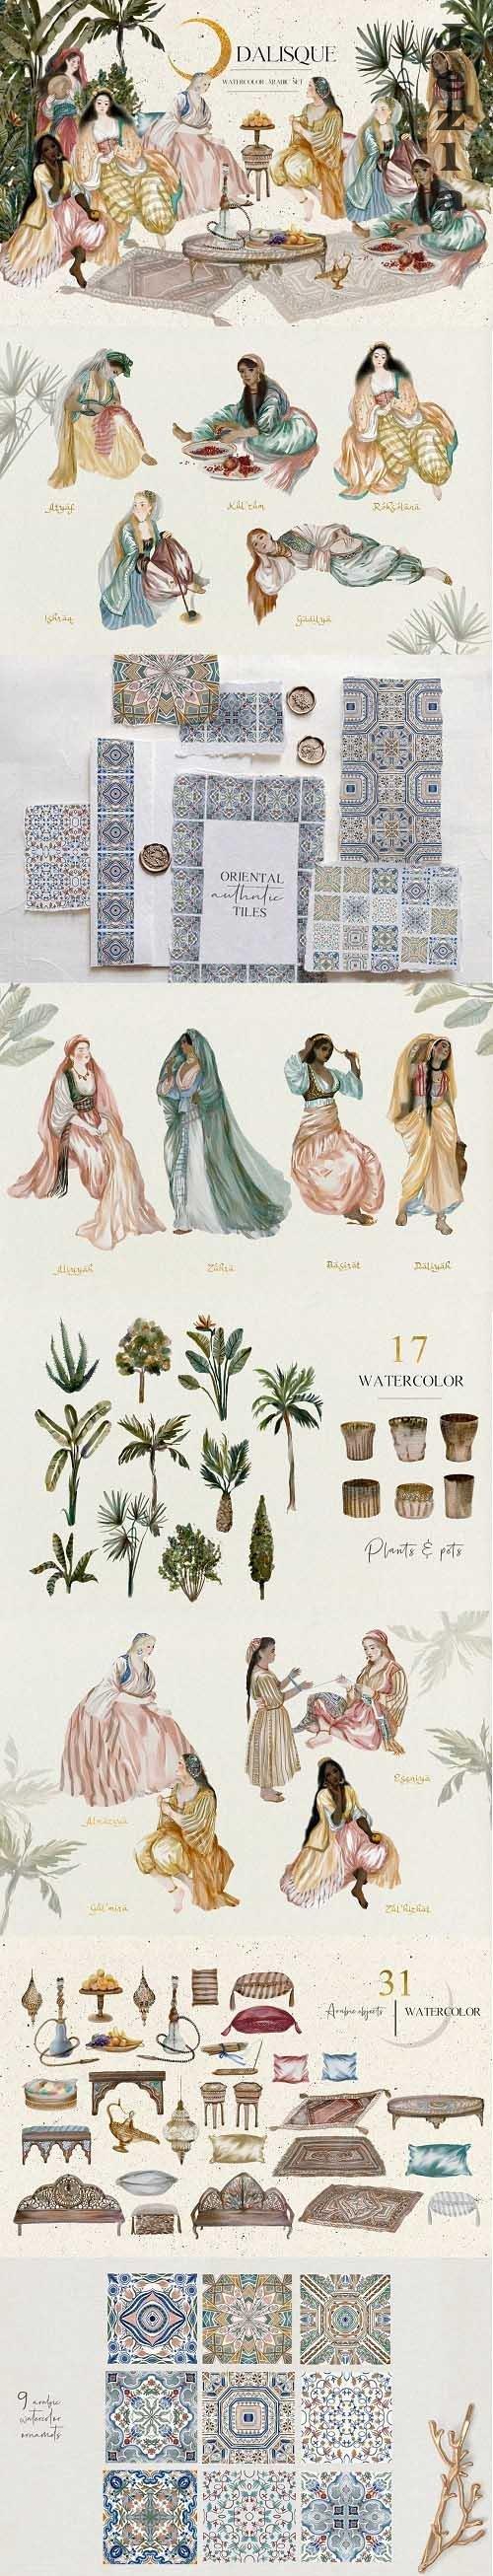 Odalisque - Watercolor Harem Creator - 5077161